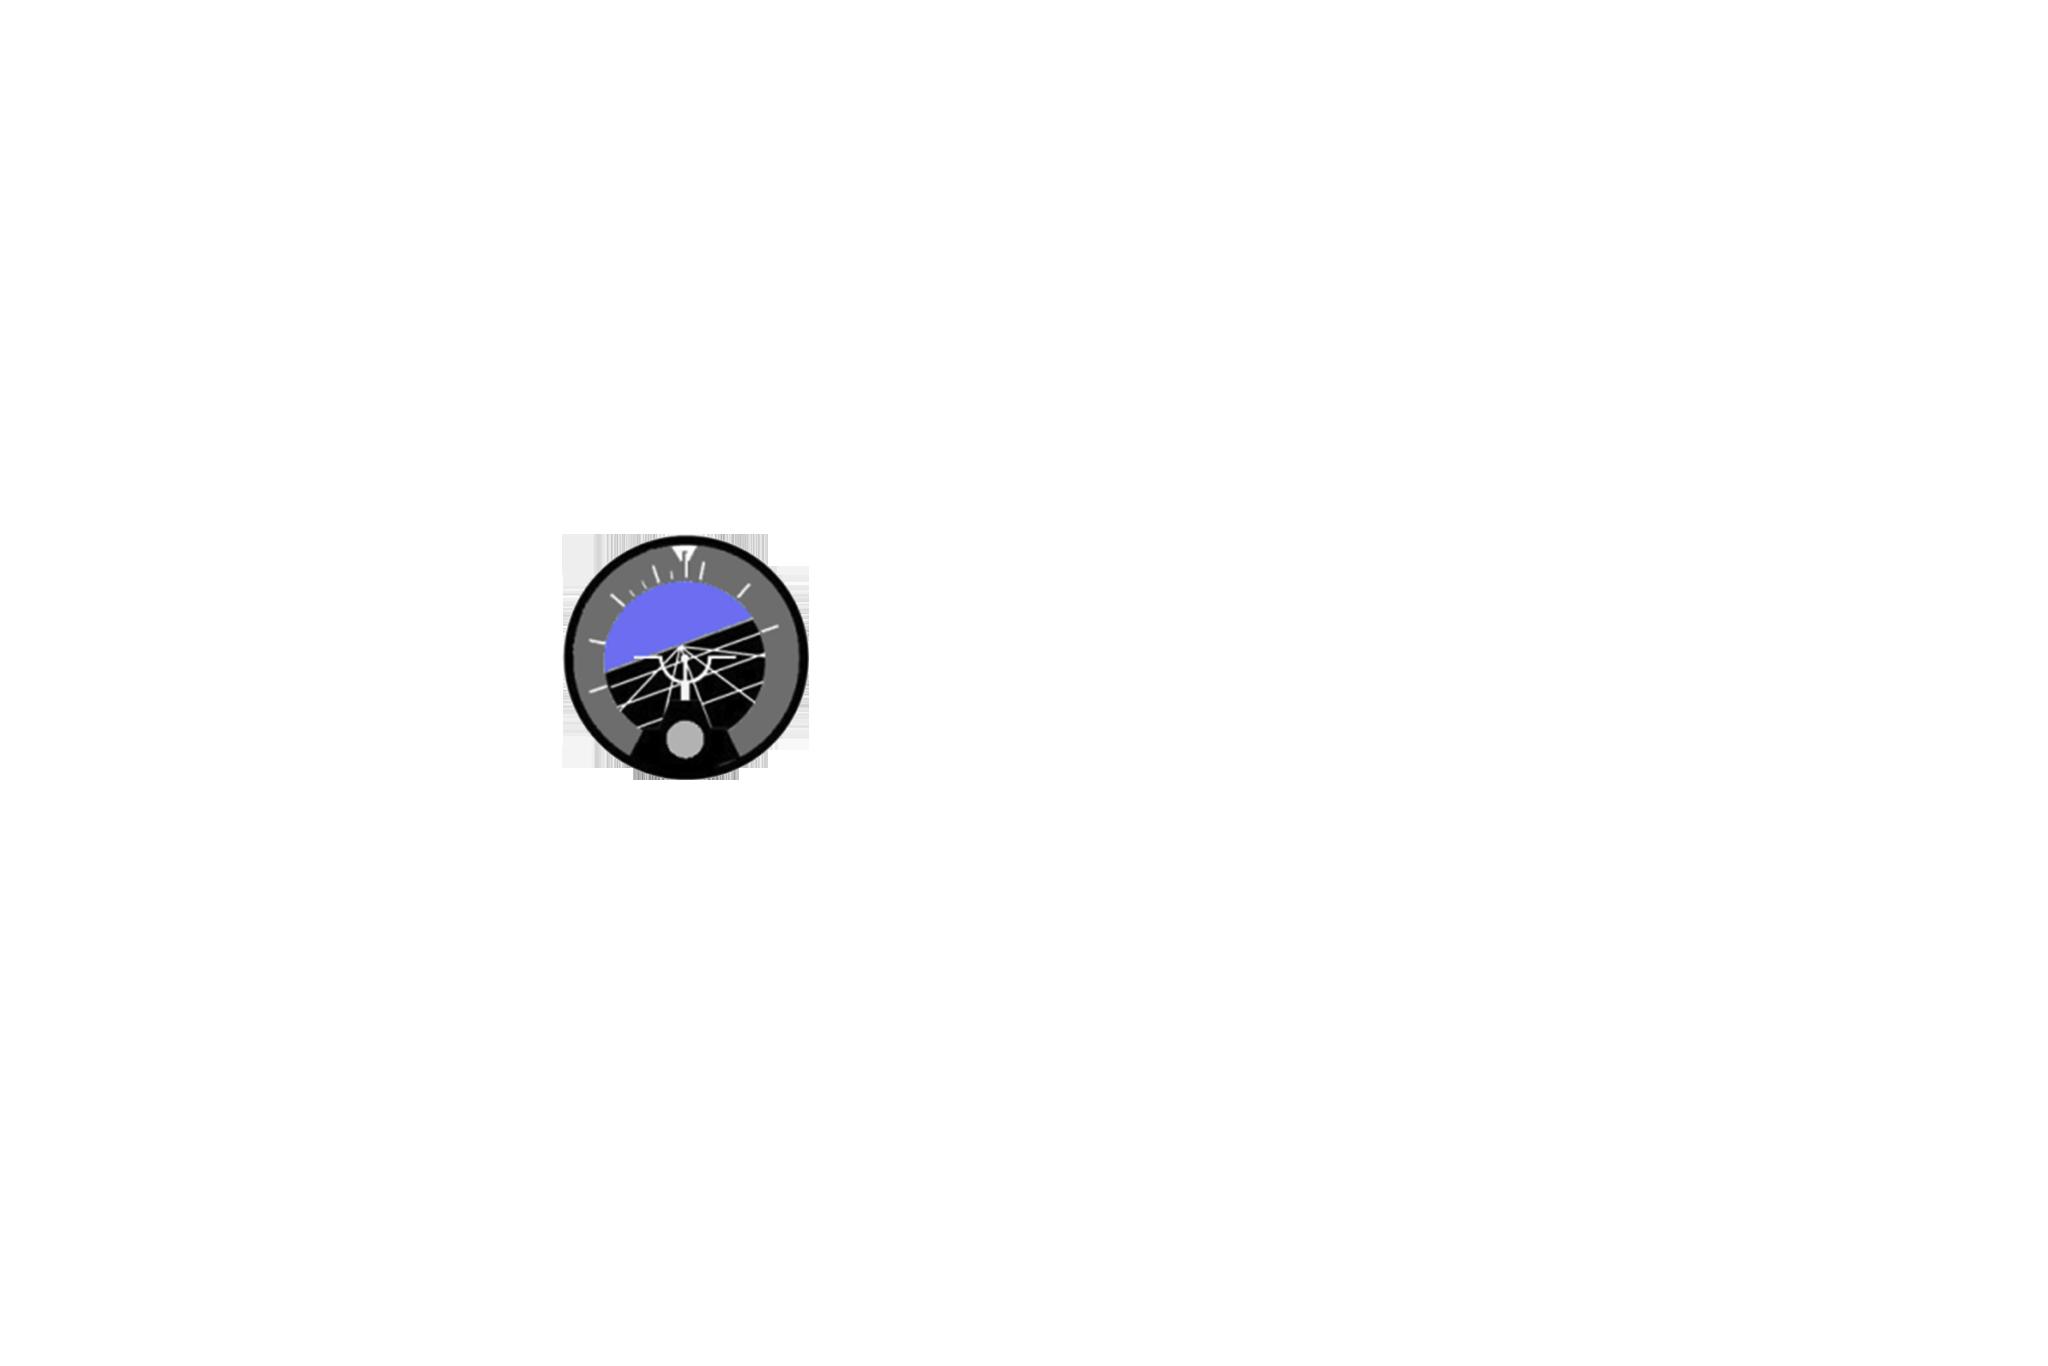 Crosswind Images